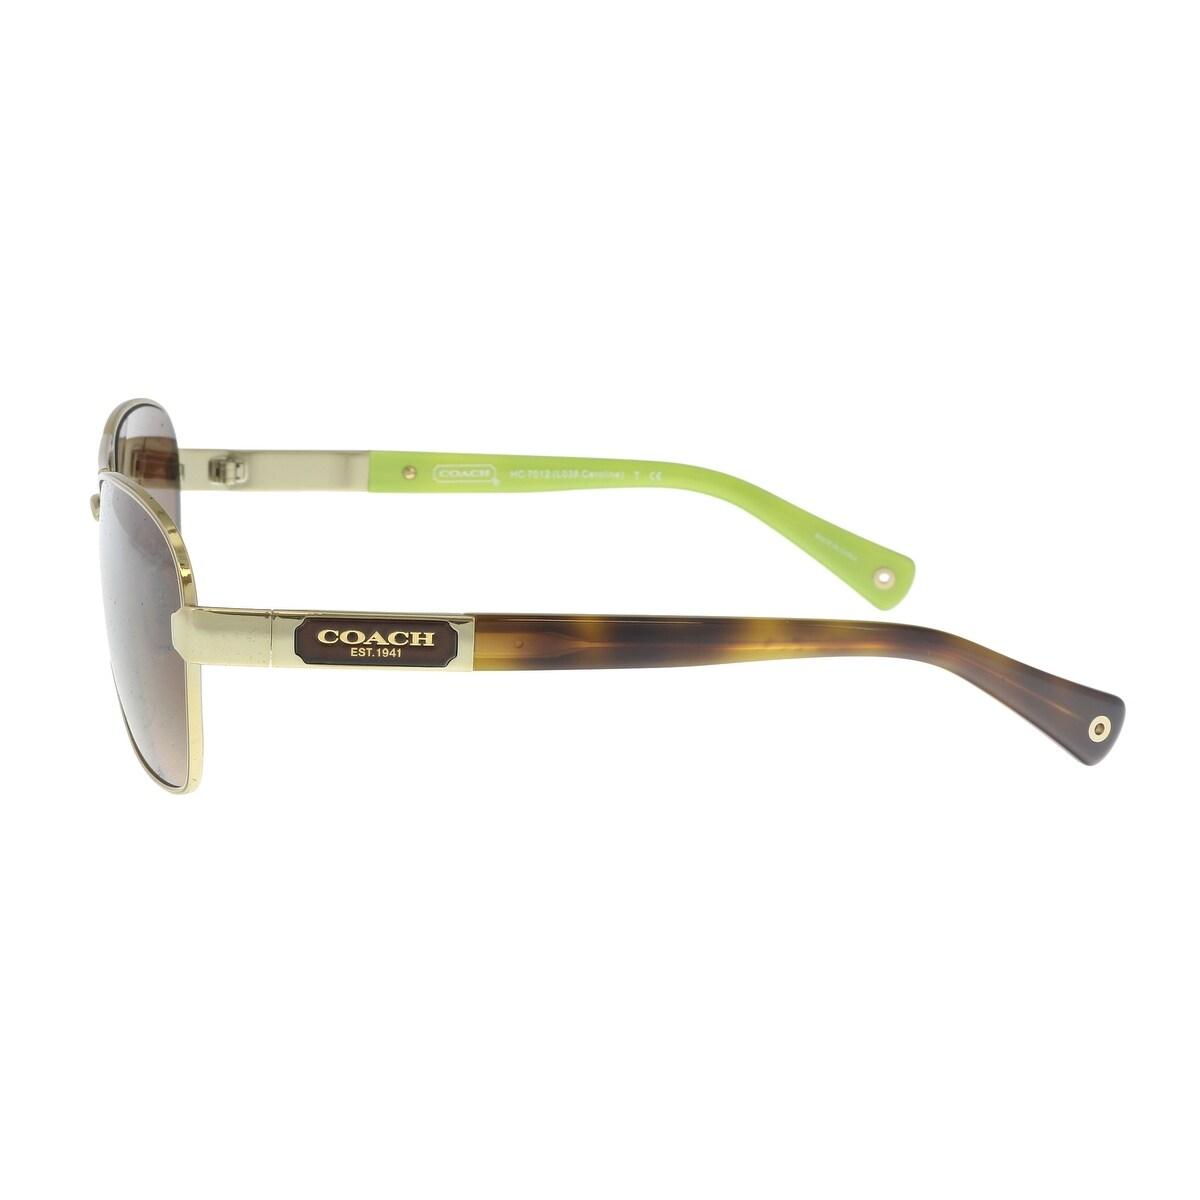 46b5d417fbb7 Shop Coach HC7012 910013 Gold / Tortoise Aviator Sunglasses - 56-14-130 -  Free Shipping Today - Overstock - 21387256